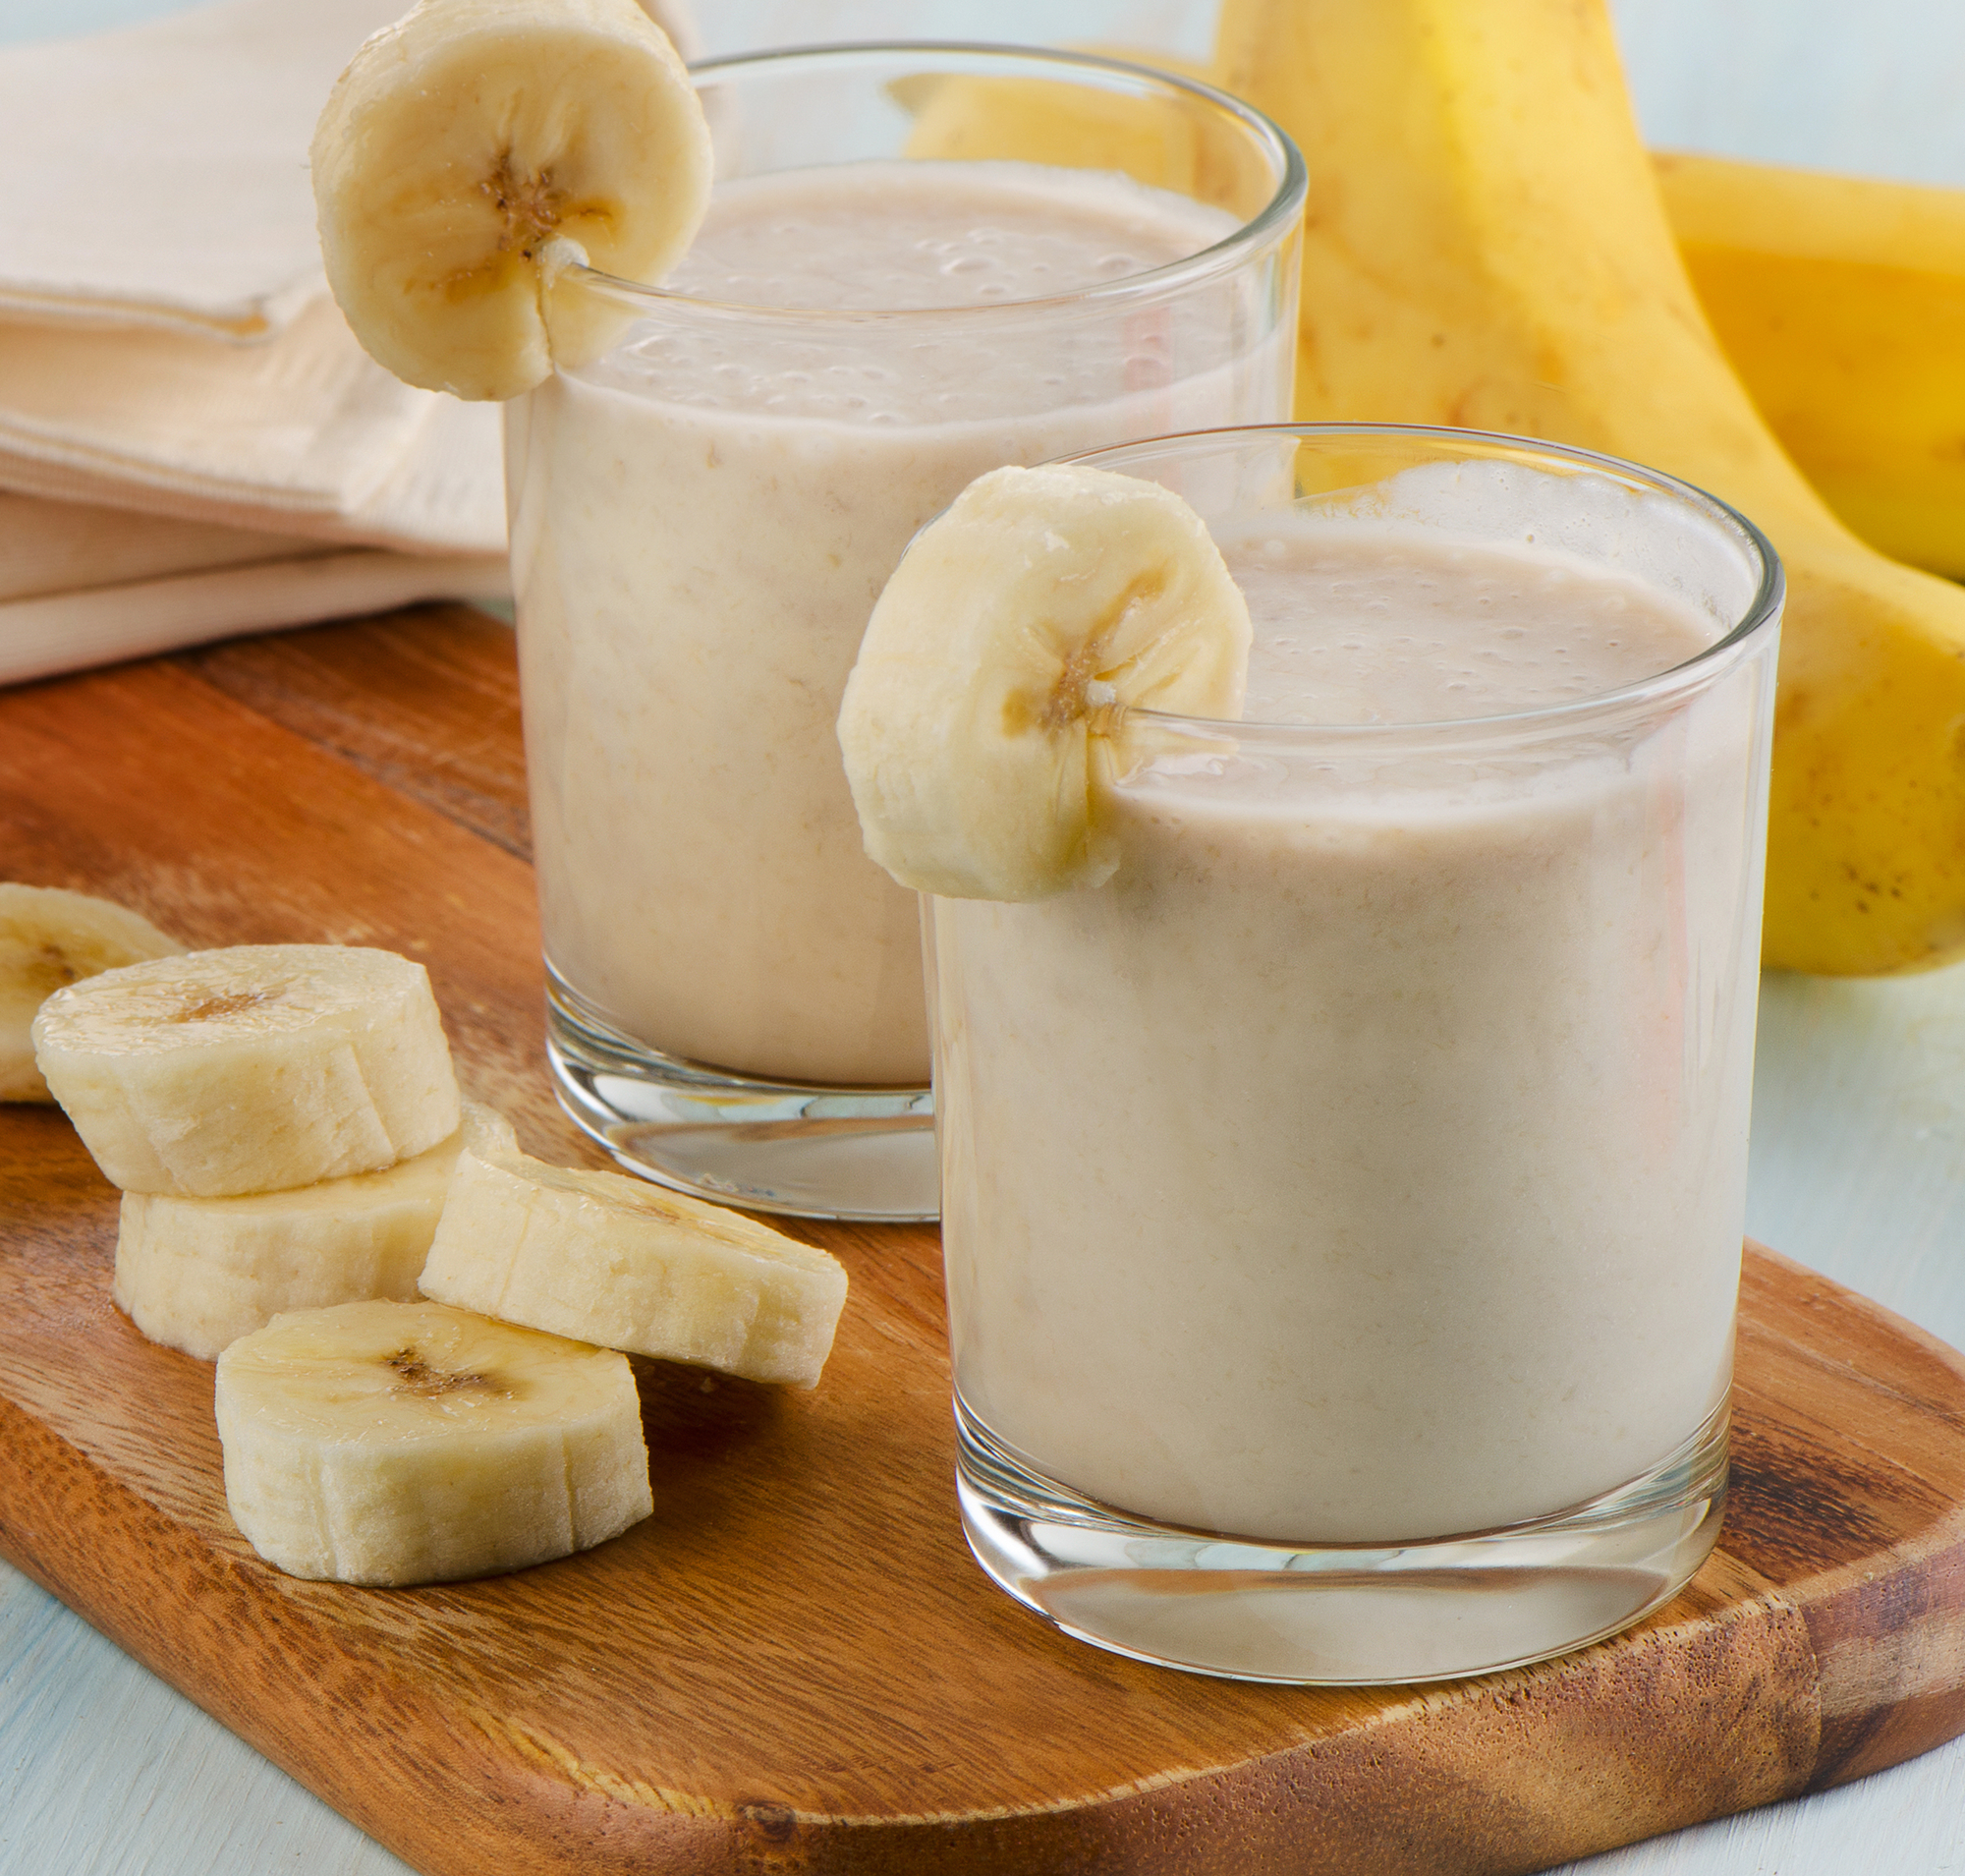 bananenmilch laktosefrei rezept kochenohne